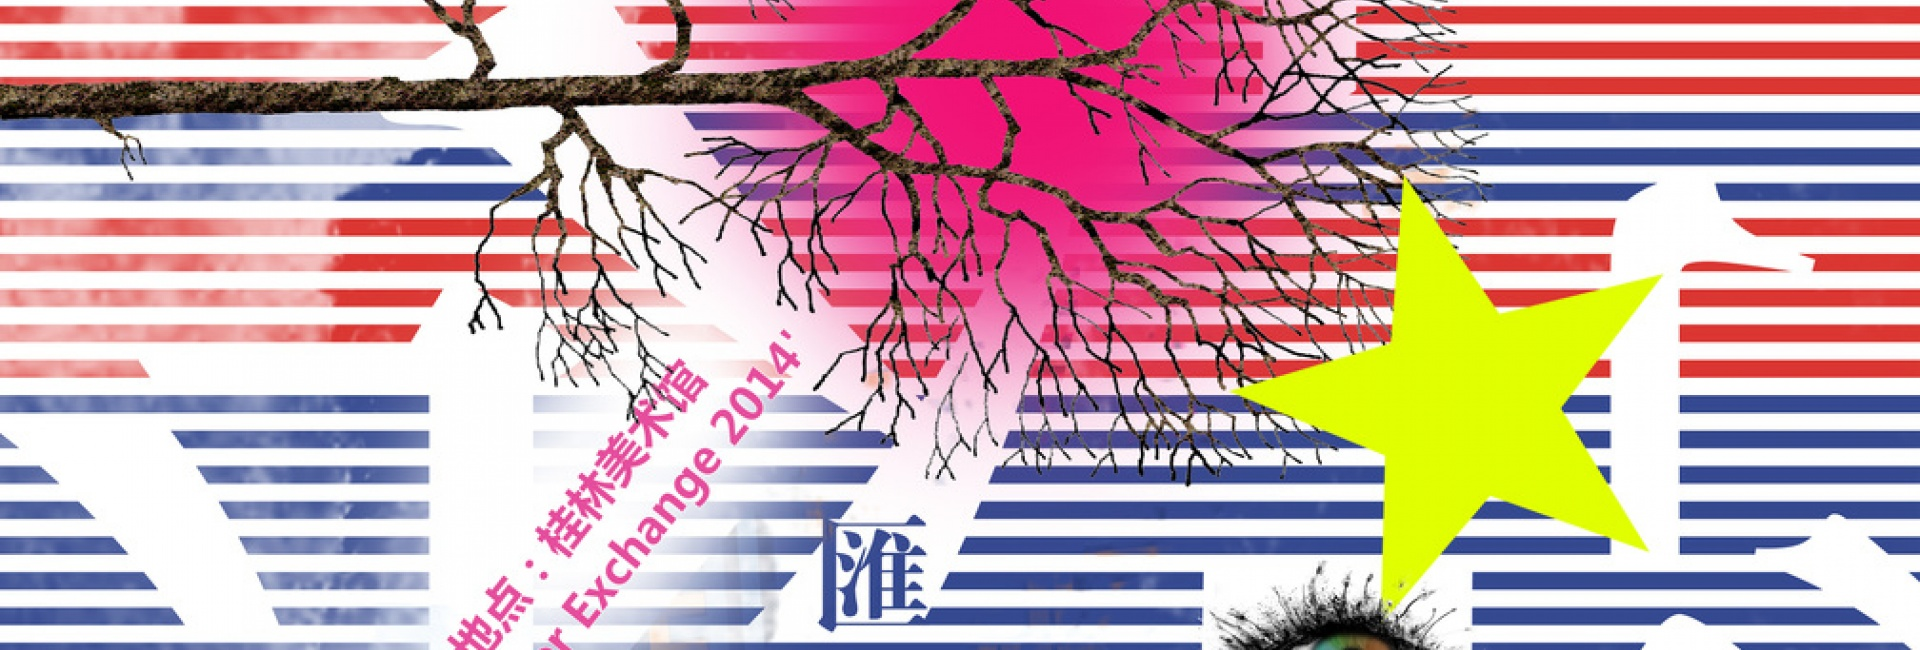 Usa & China Typographic Poster Exchange